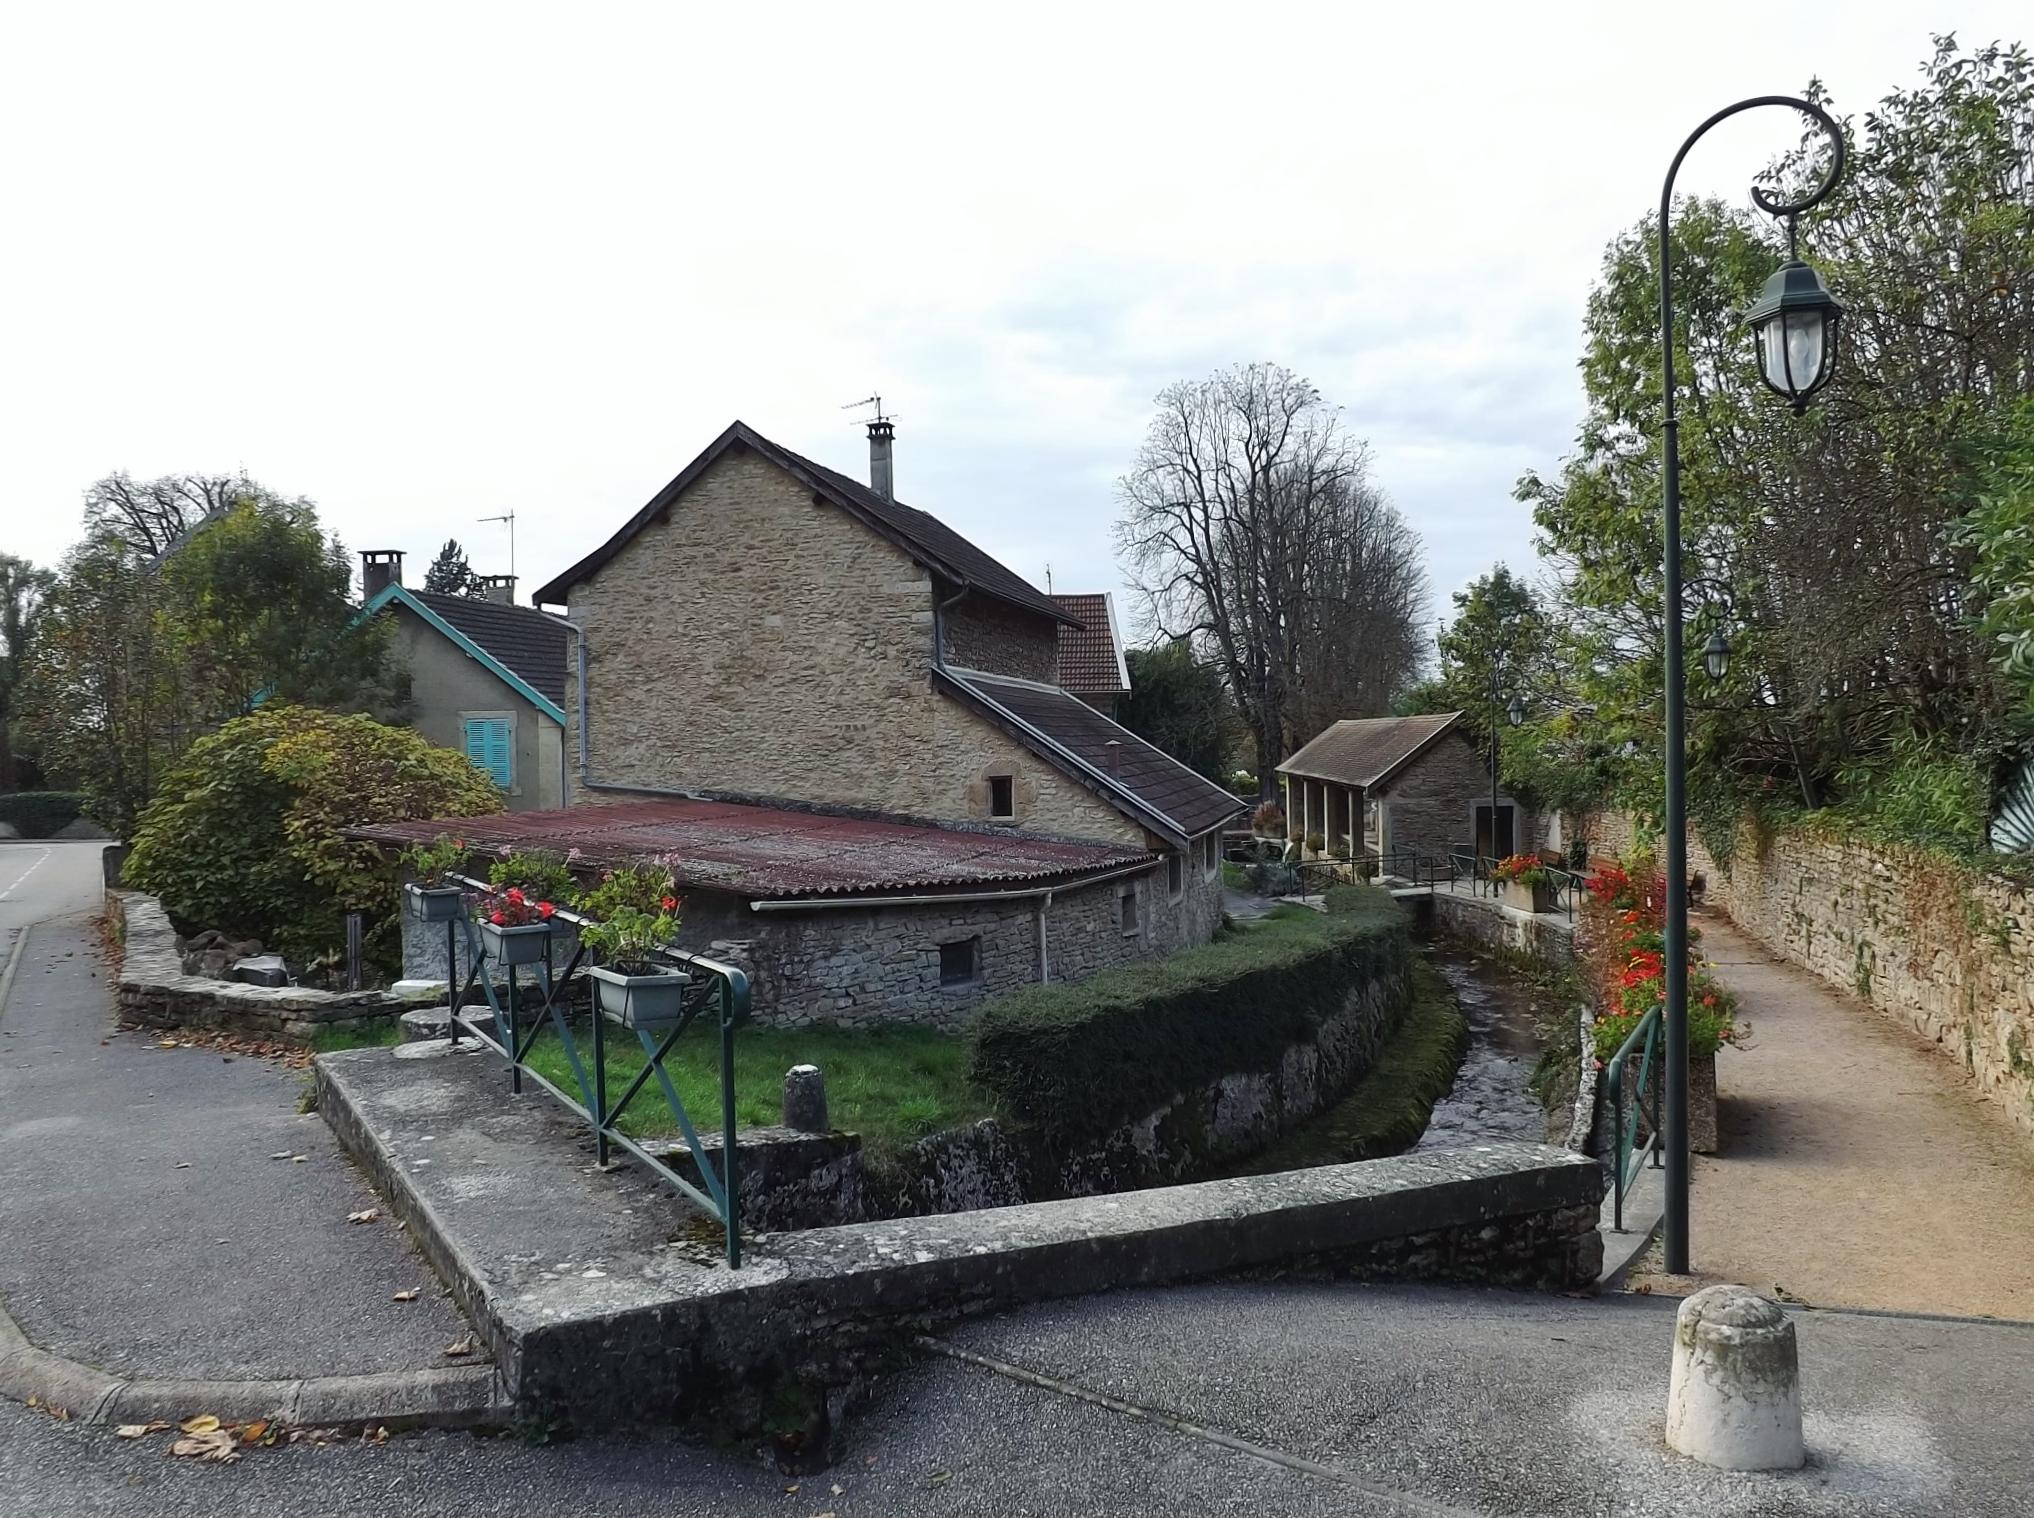 Verre Clair Saint Maximin la balme-les-grottes - wikipedia